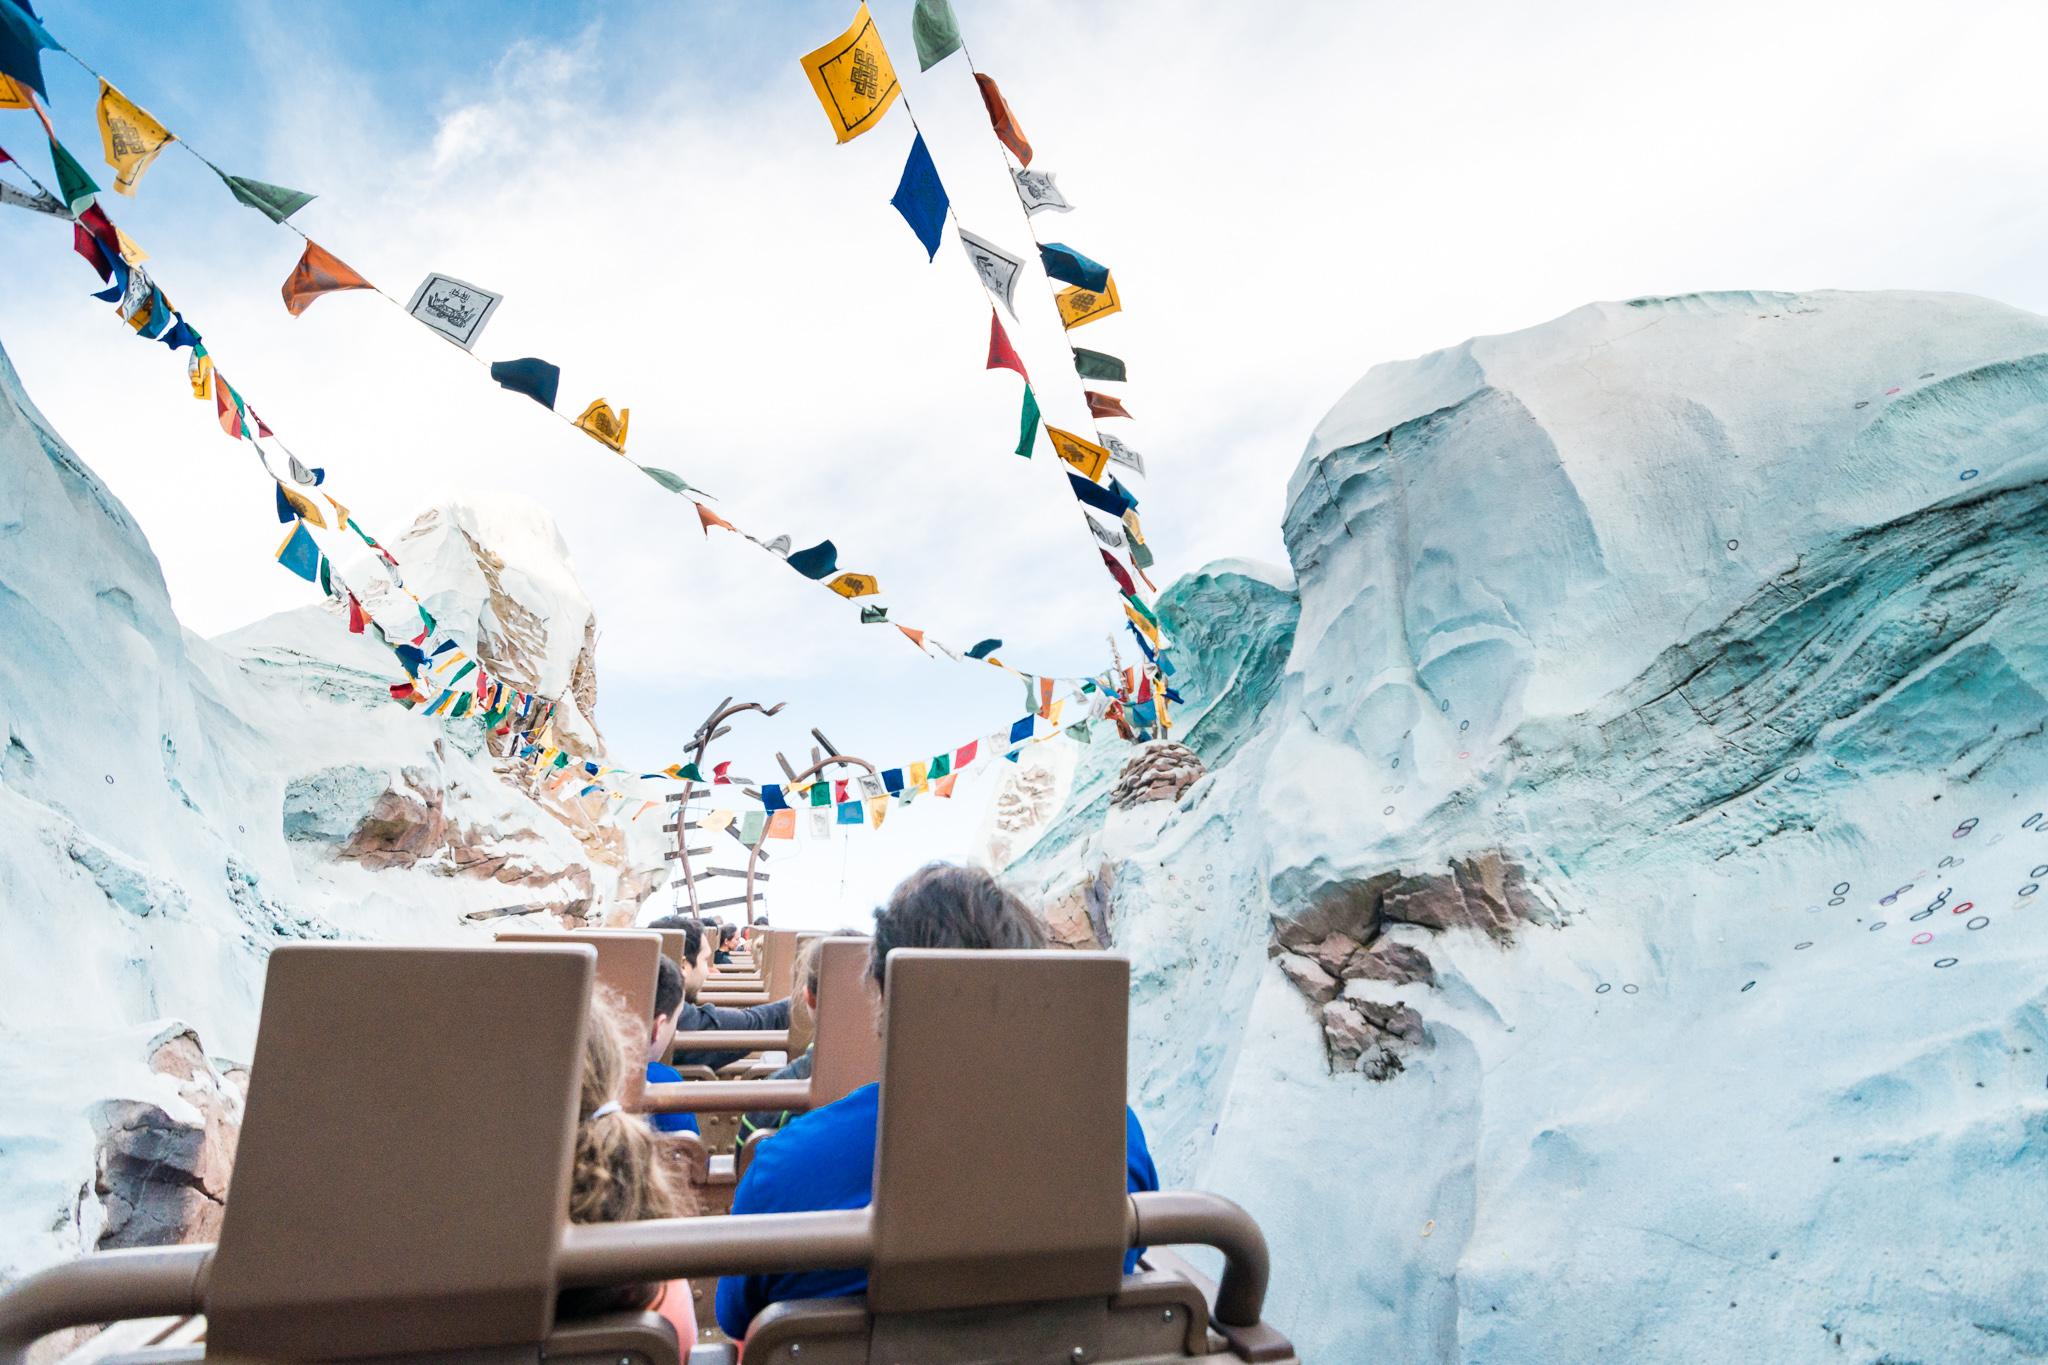 Expedition Everest Summit - Disney's Animal Kingdom